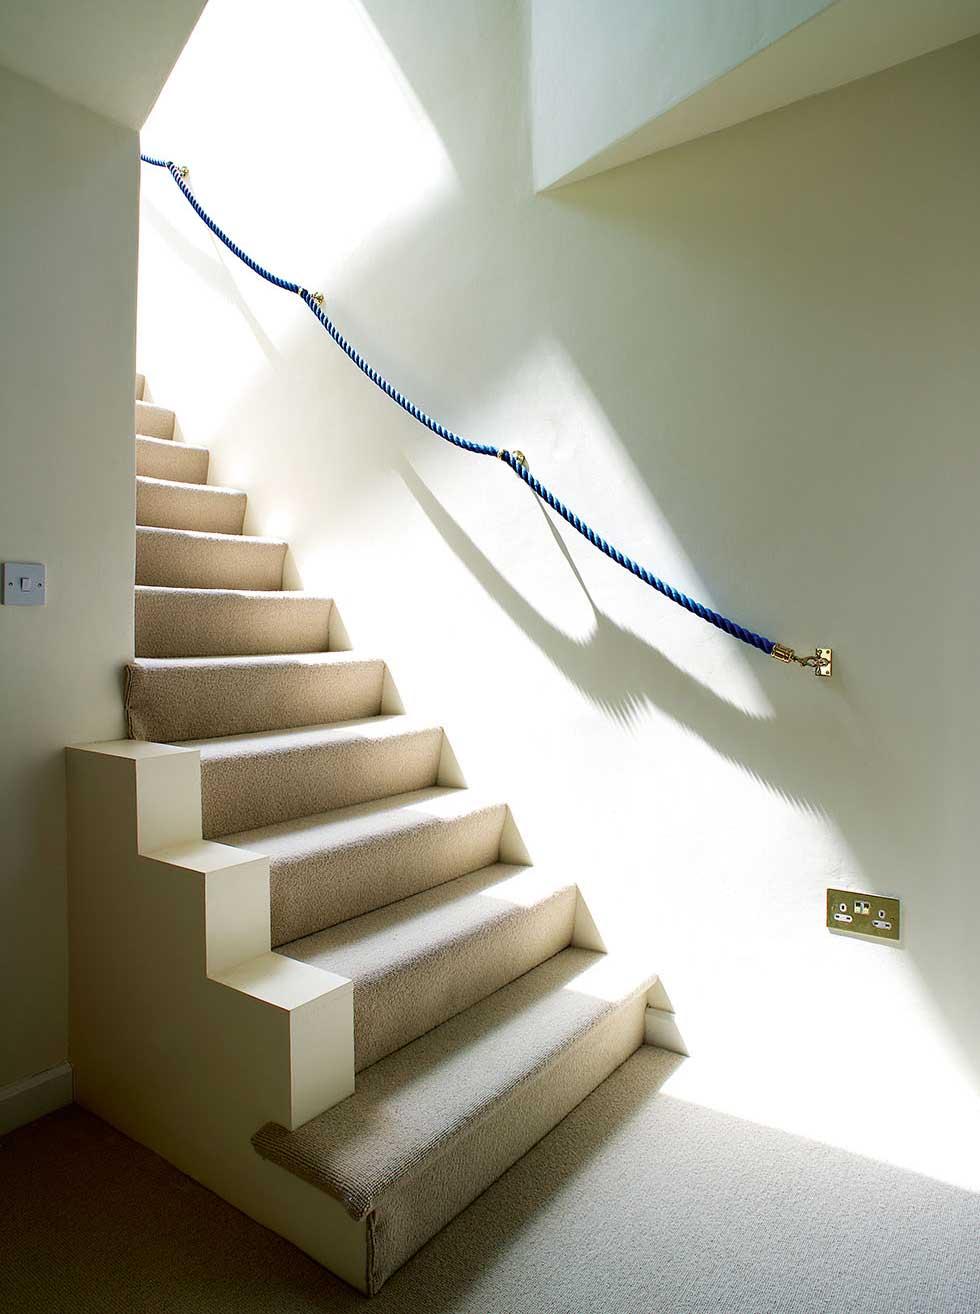 The white staircase